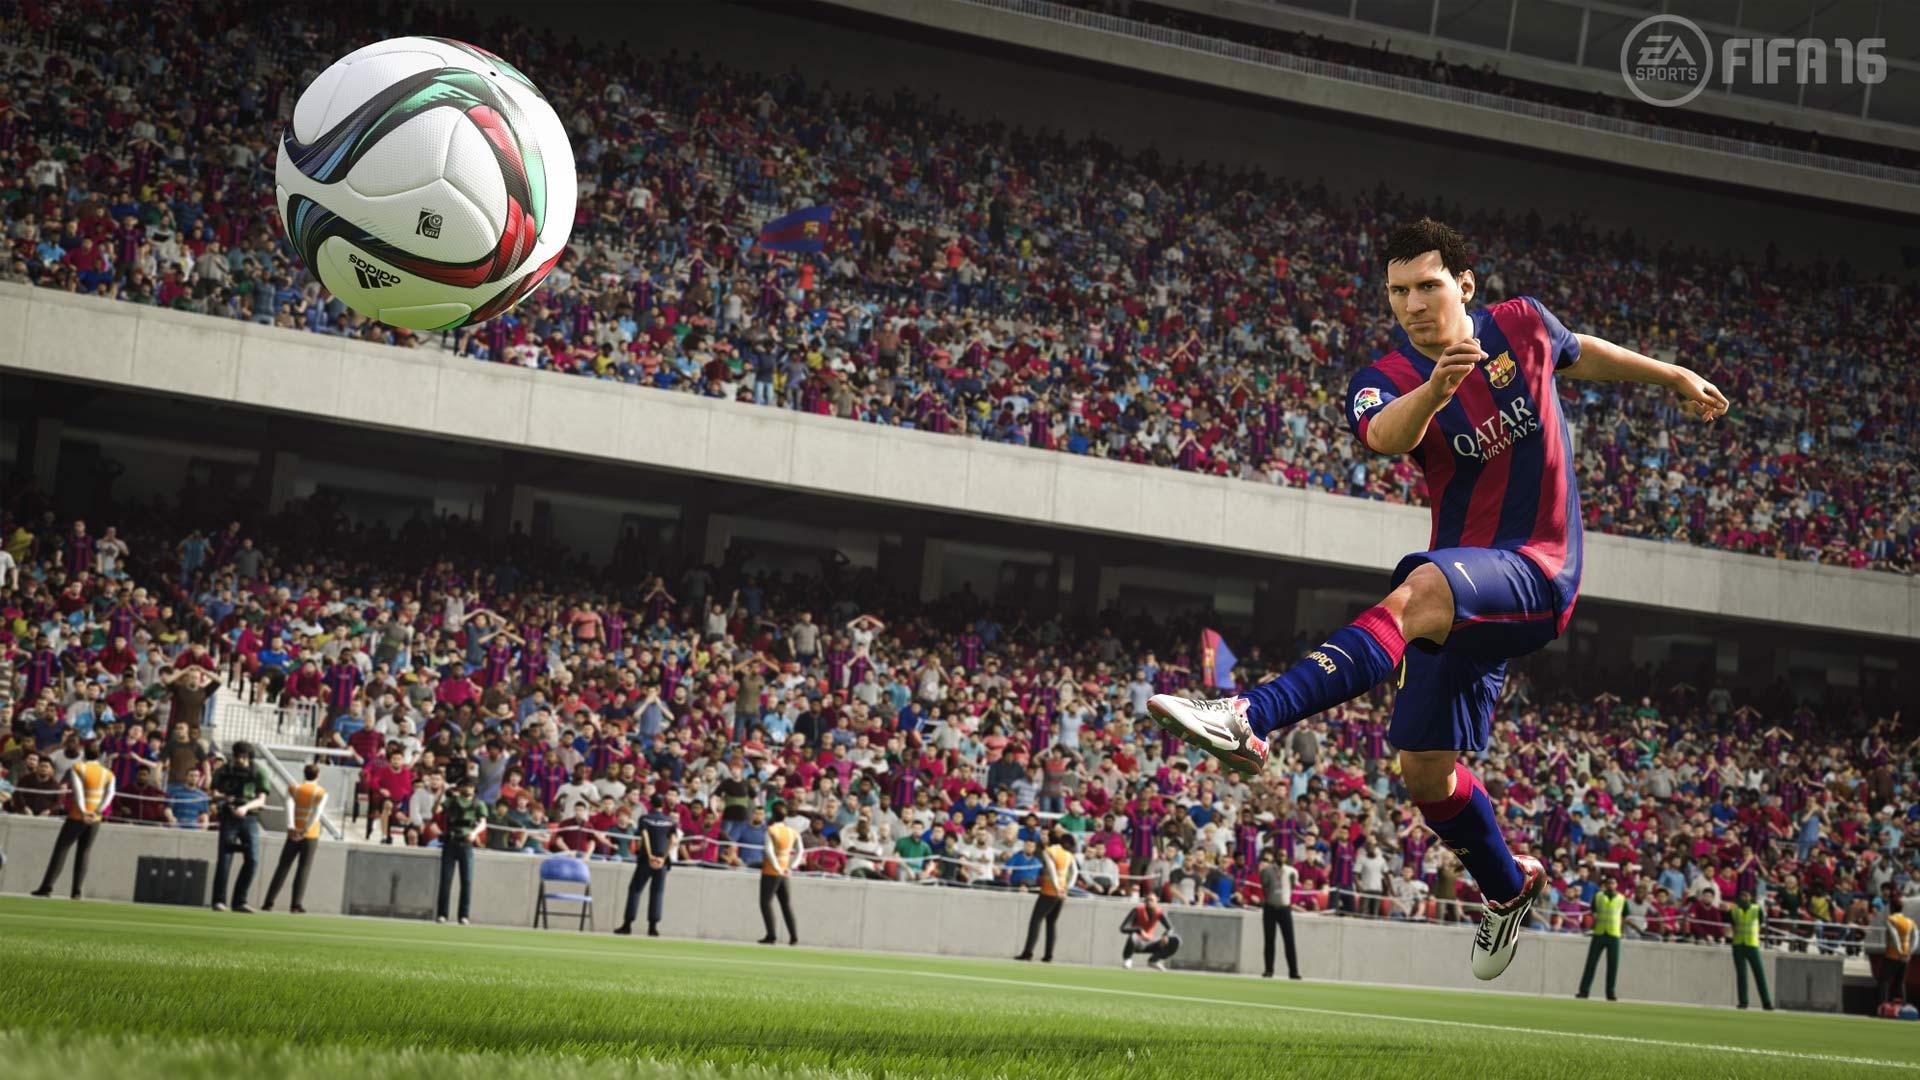 FIFA 16 Ultimate Team est disponible sous Android et iOS